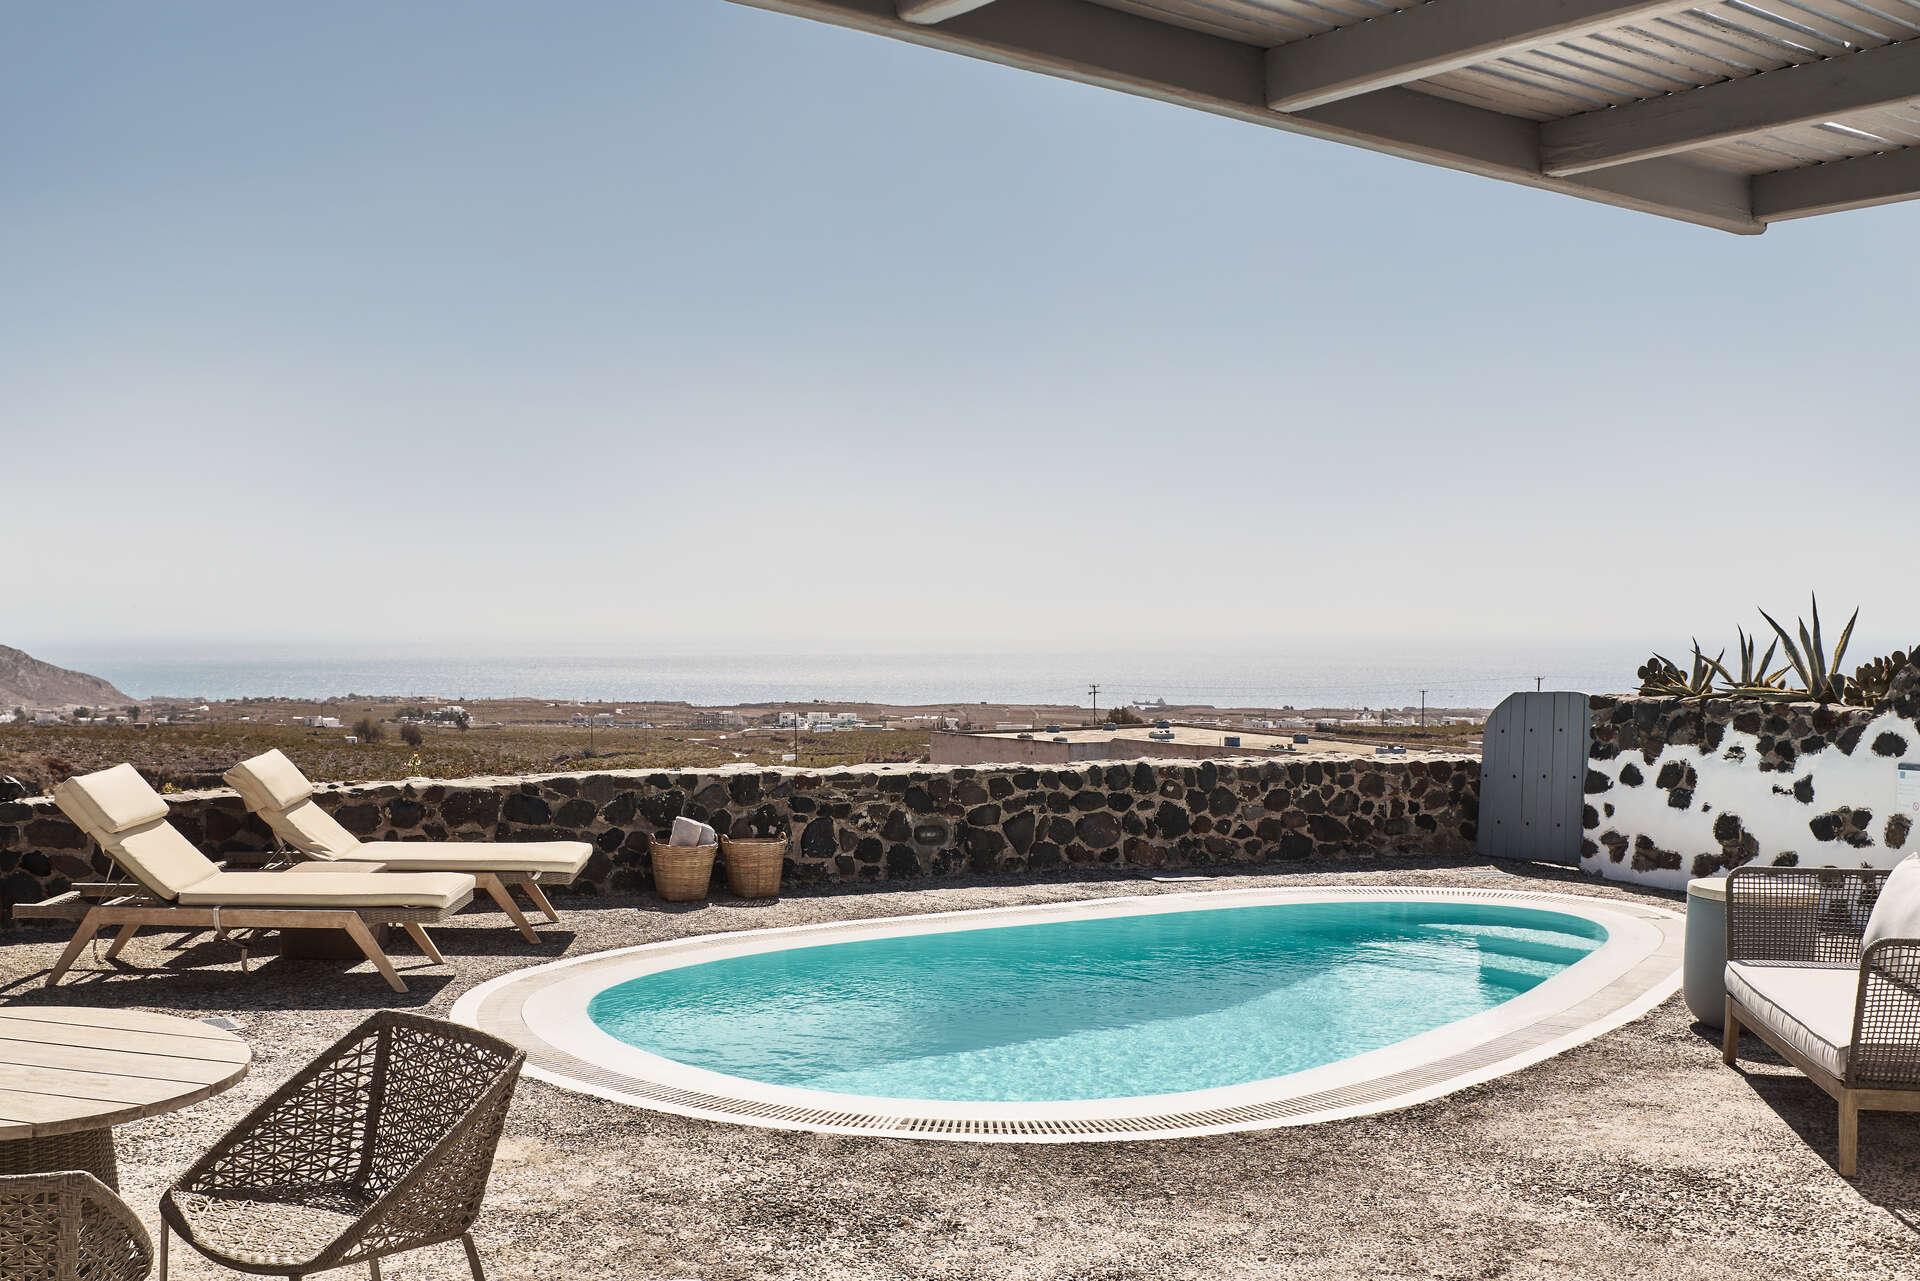 Luxury vacation rentals europe - Greece - Santorini - Vedema resort - Olympian Villa - Image 1/13